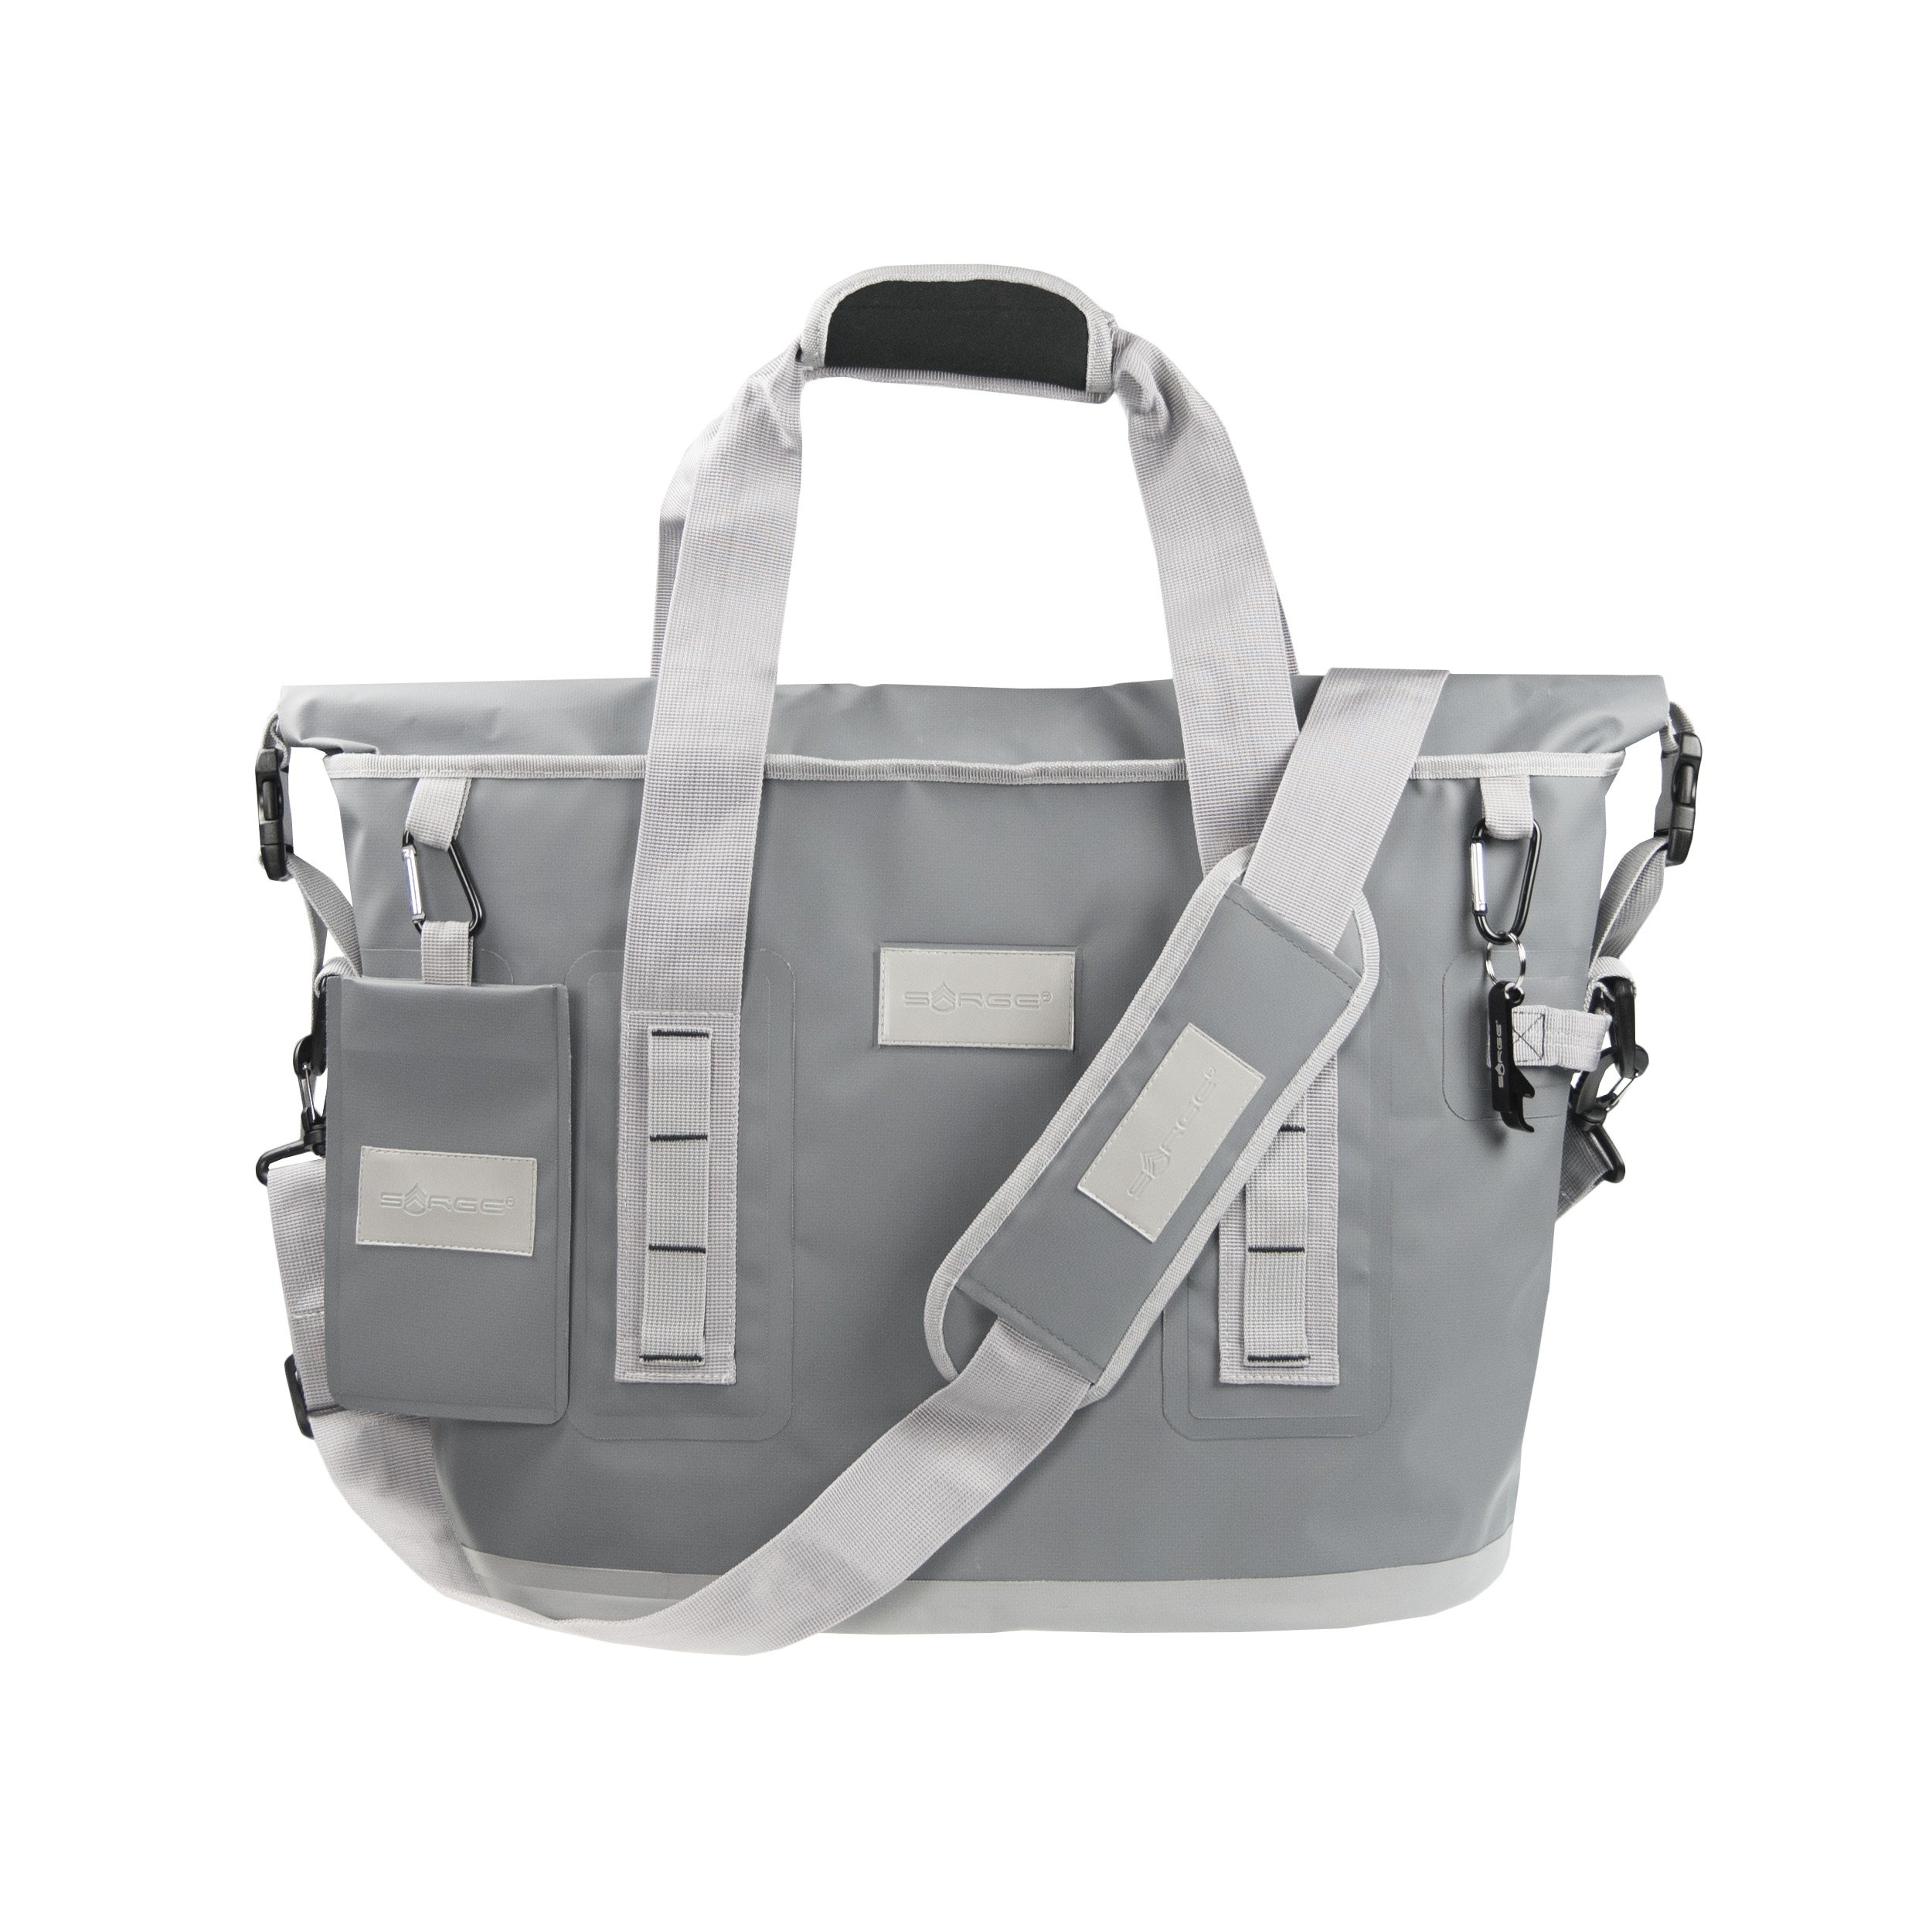 Traverse - Gray Roll Top Cooler Bag